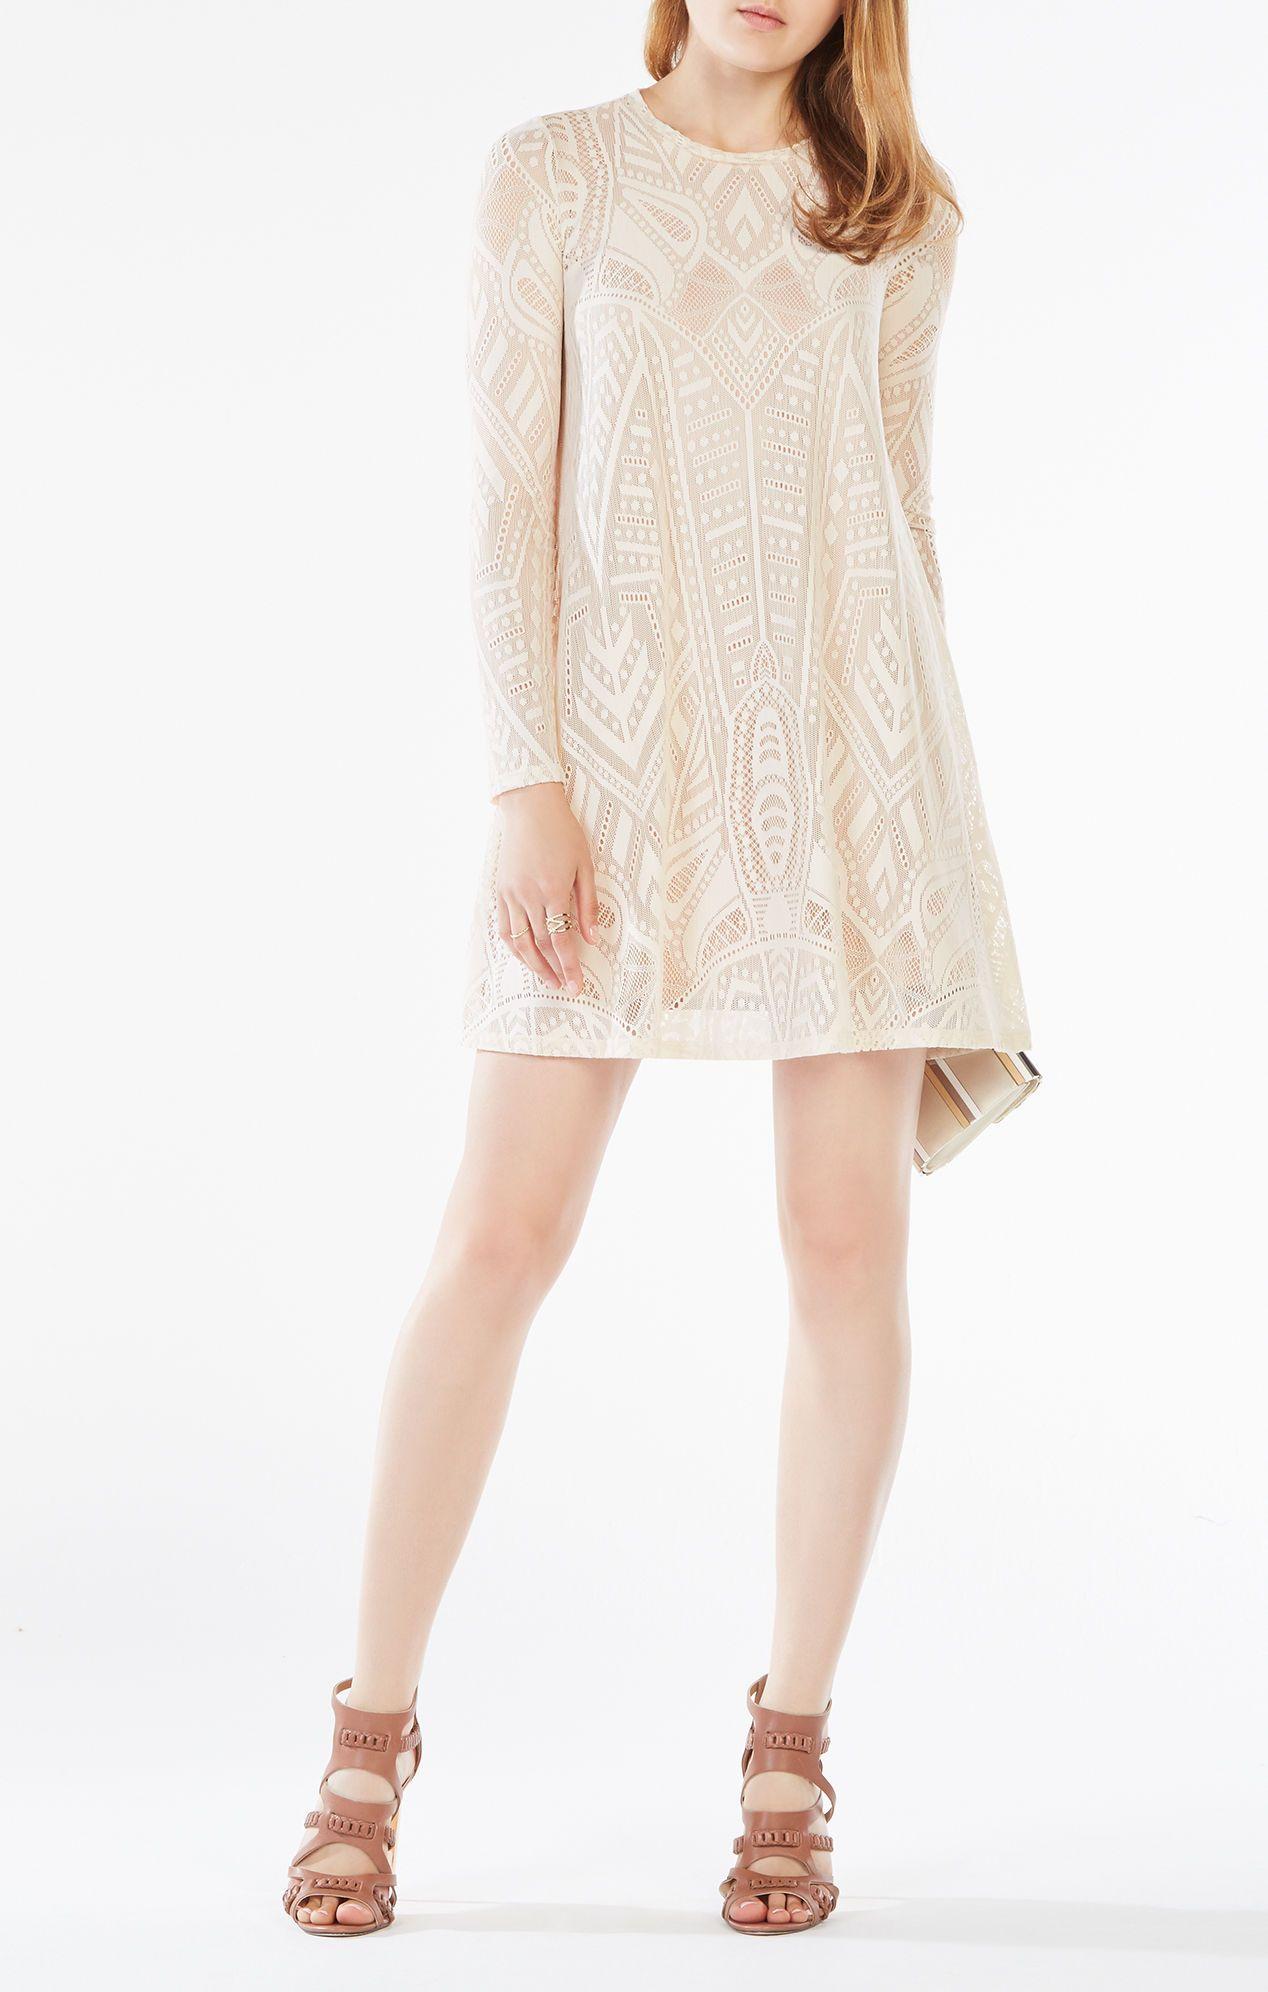 47df38b4a4 Natyly Long-Sleeve Lace Dress